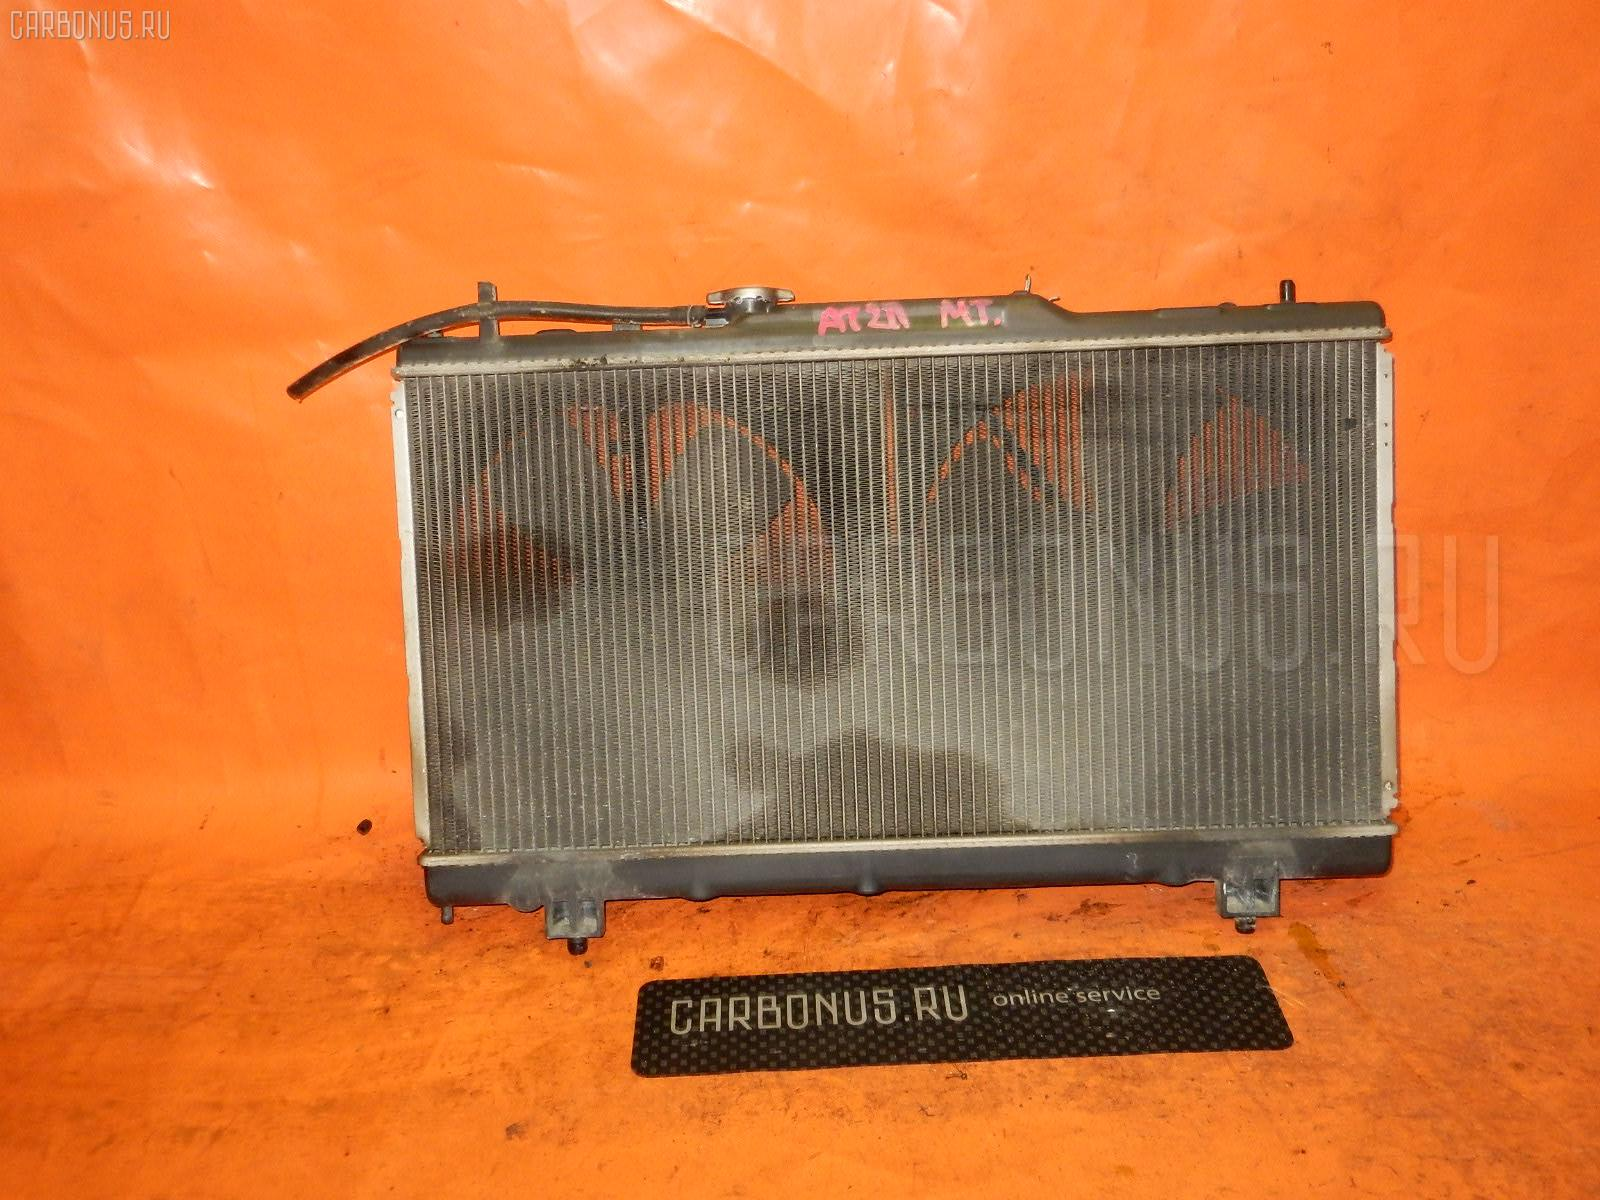 Радиатор ДВС TOYOTA CORONA PREMIO AT211 7A-FE. Фото 2